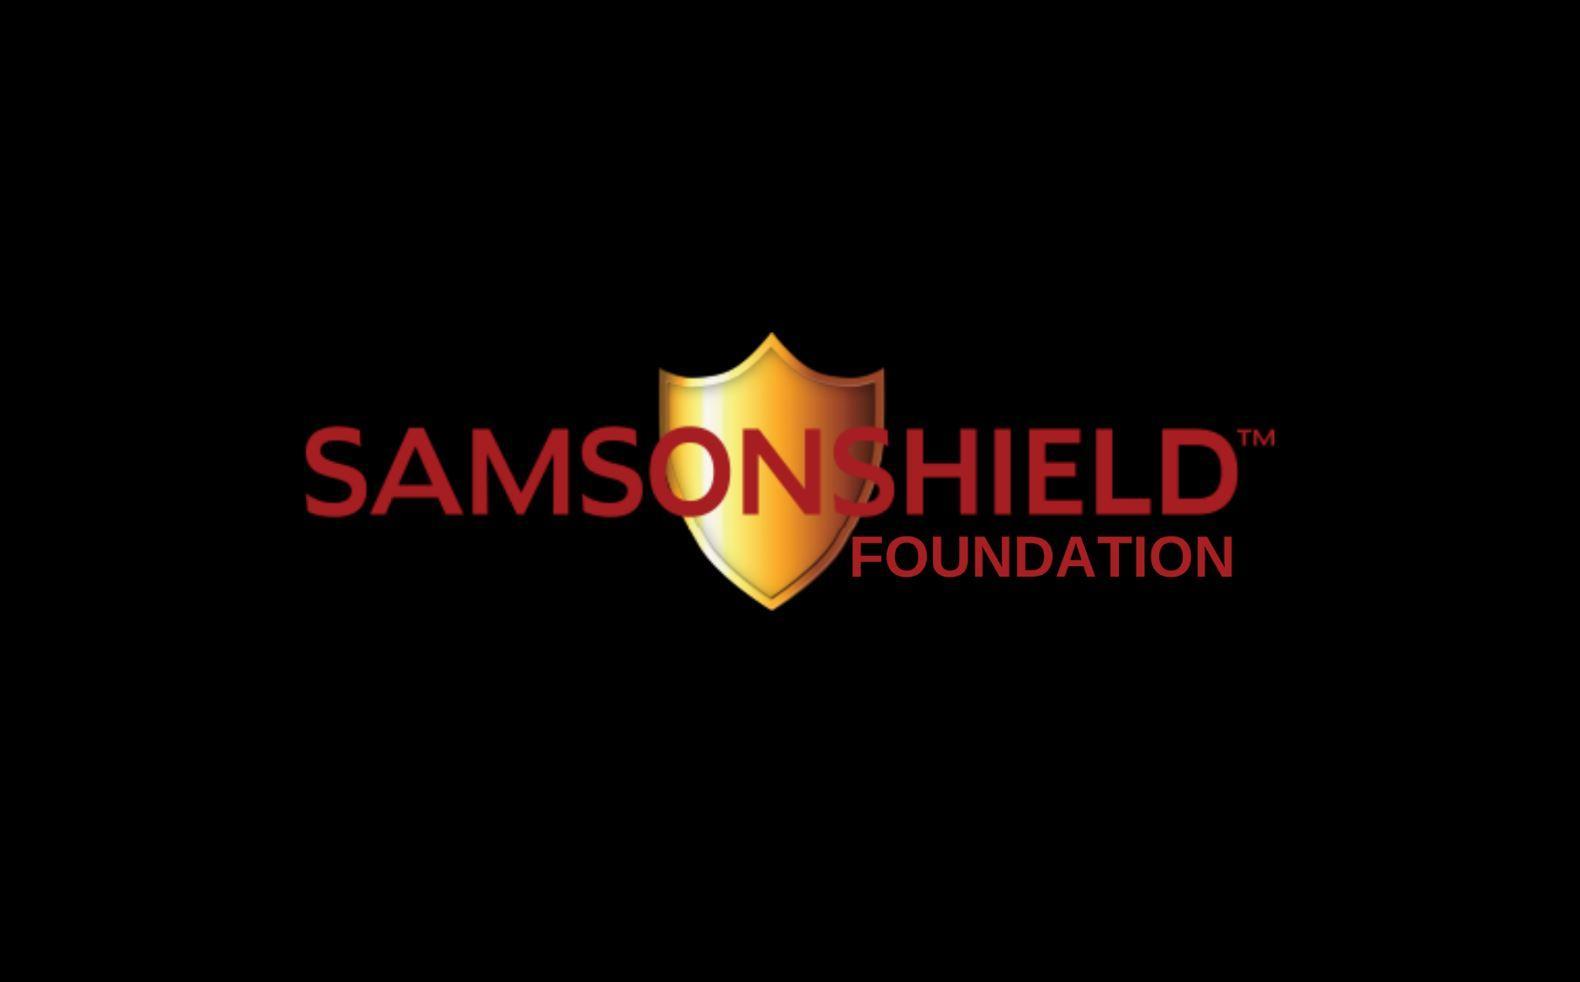 The Samsonshield Foundation